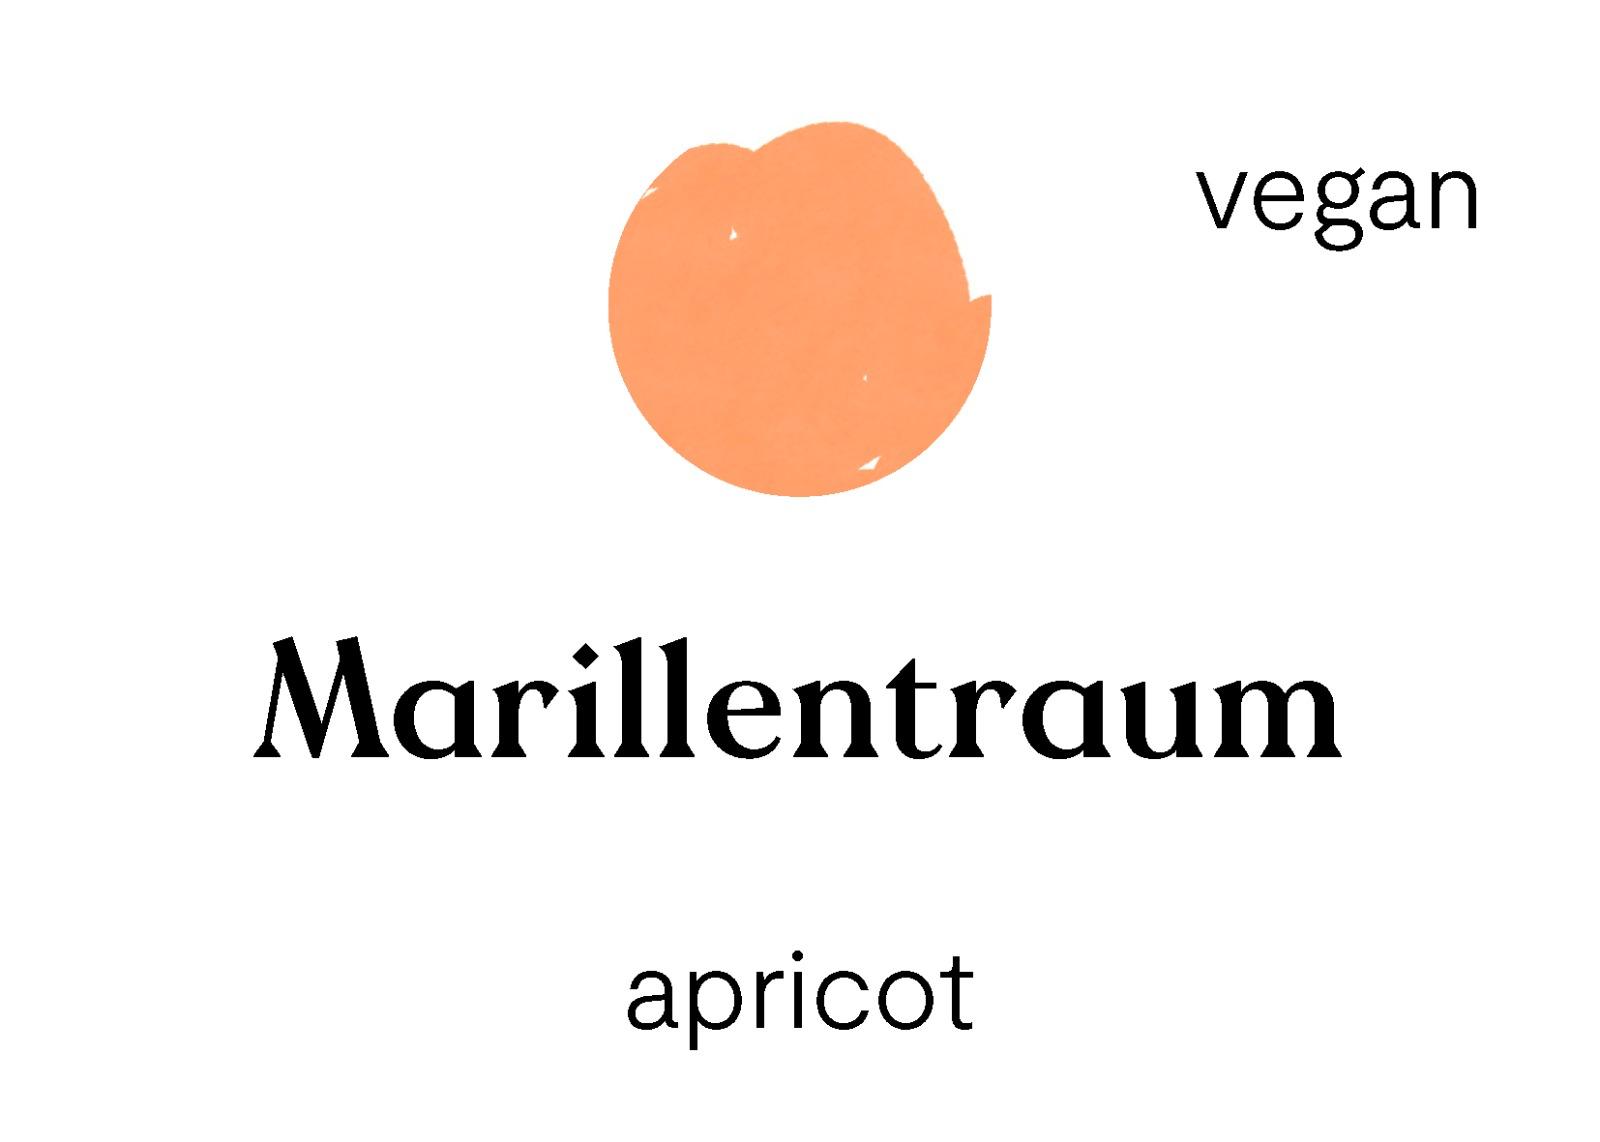 Marillentraum